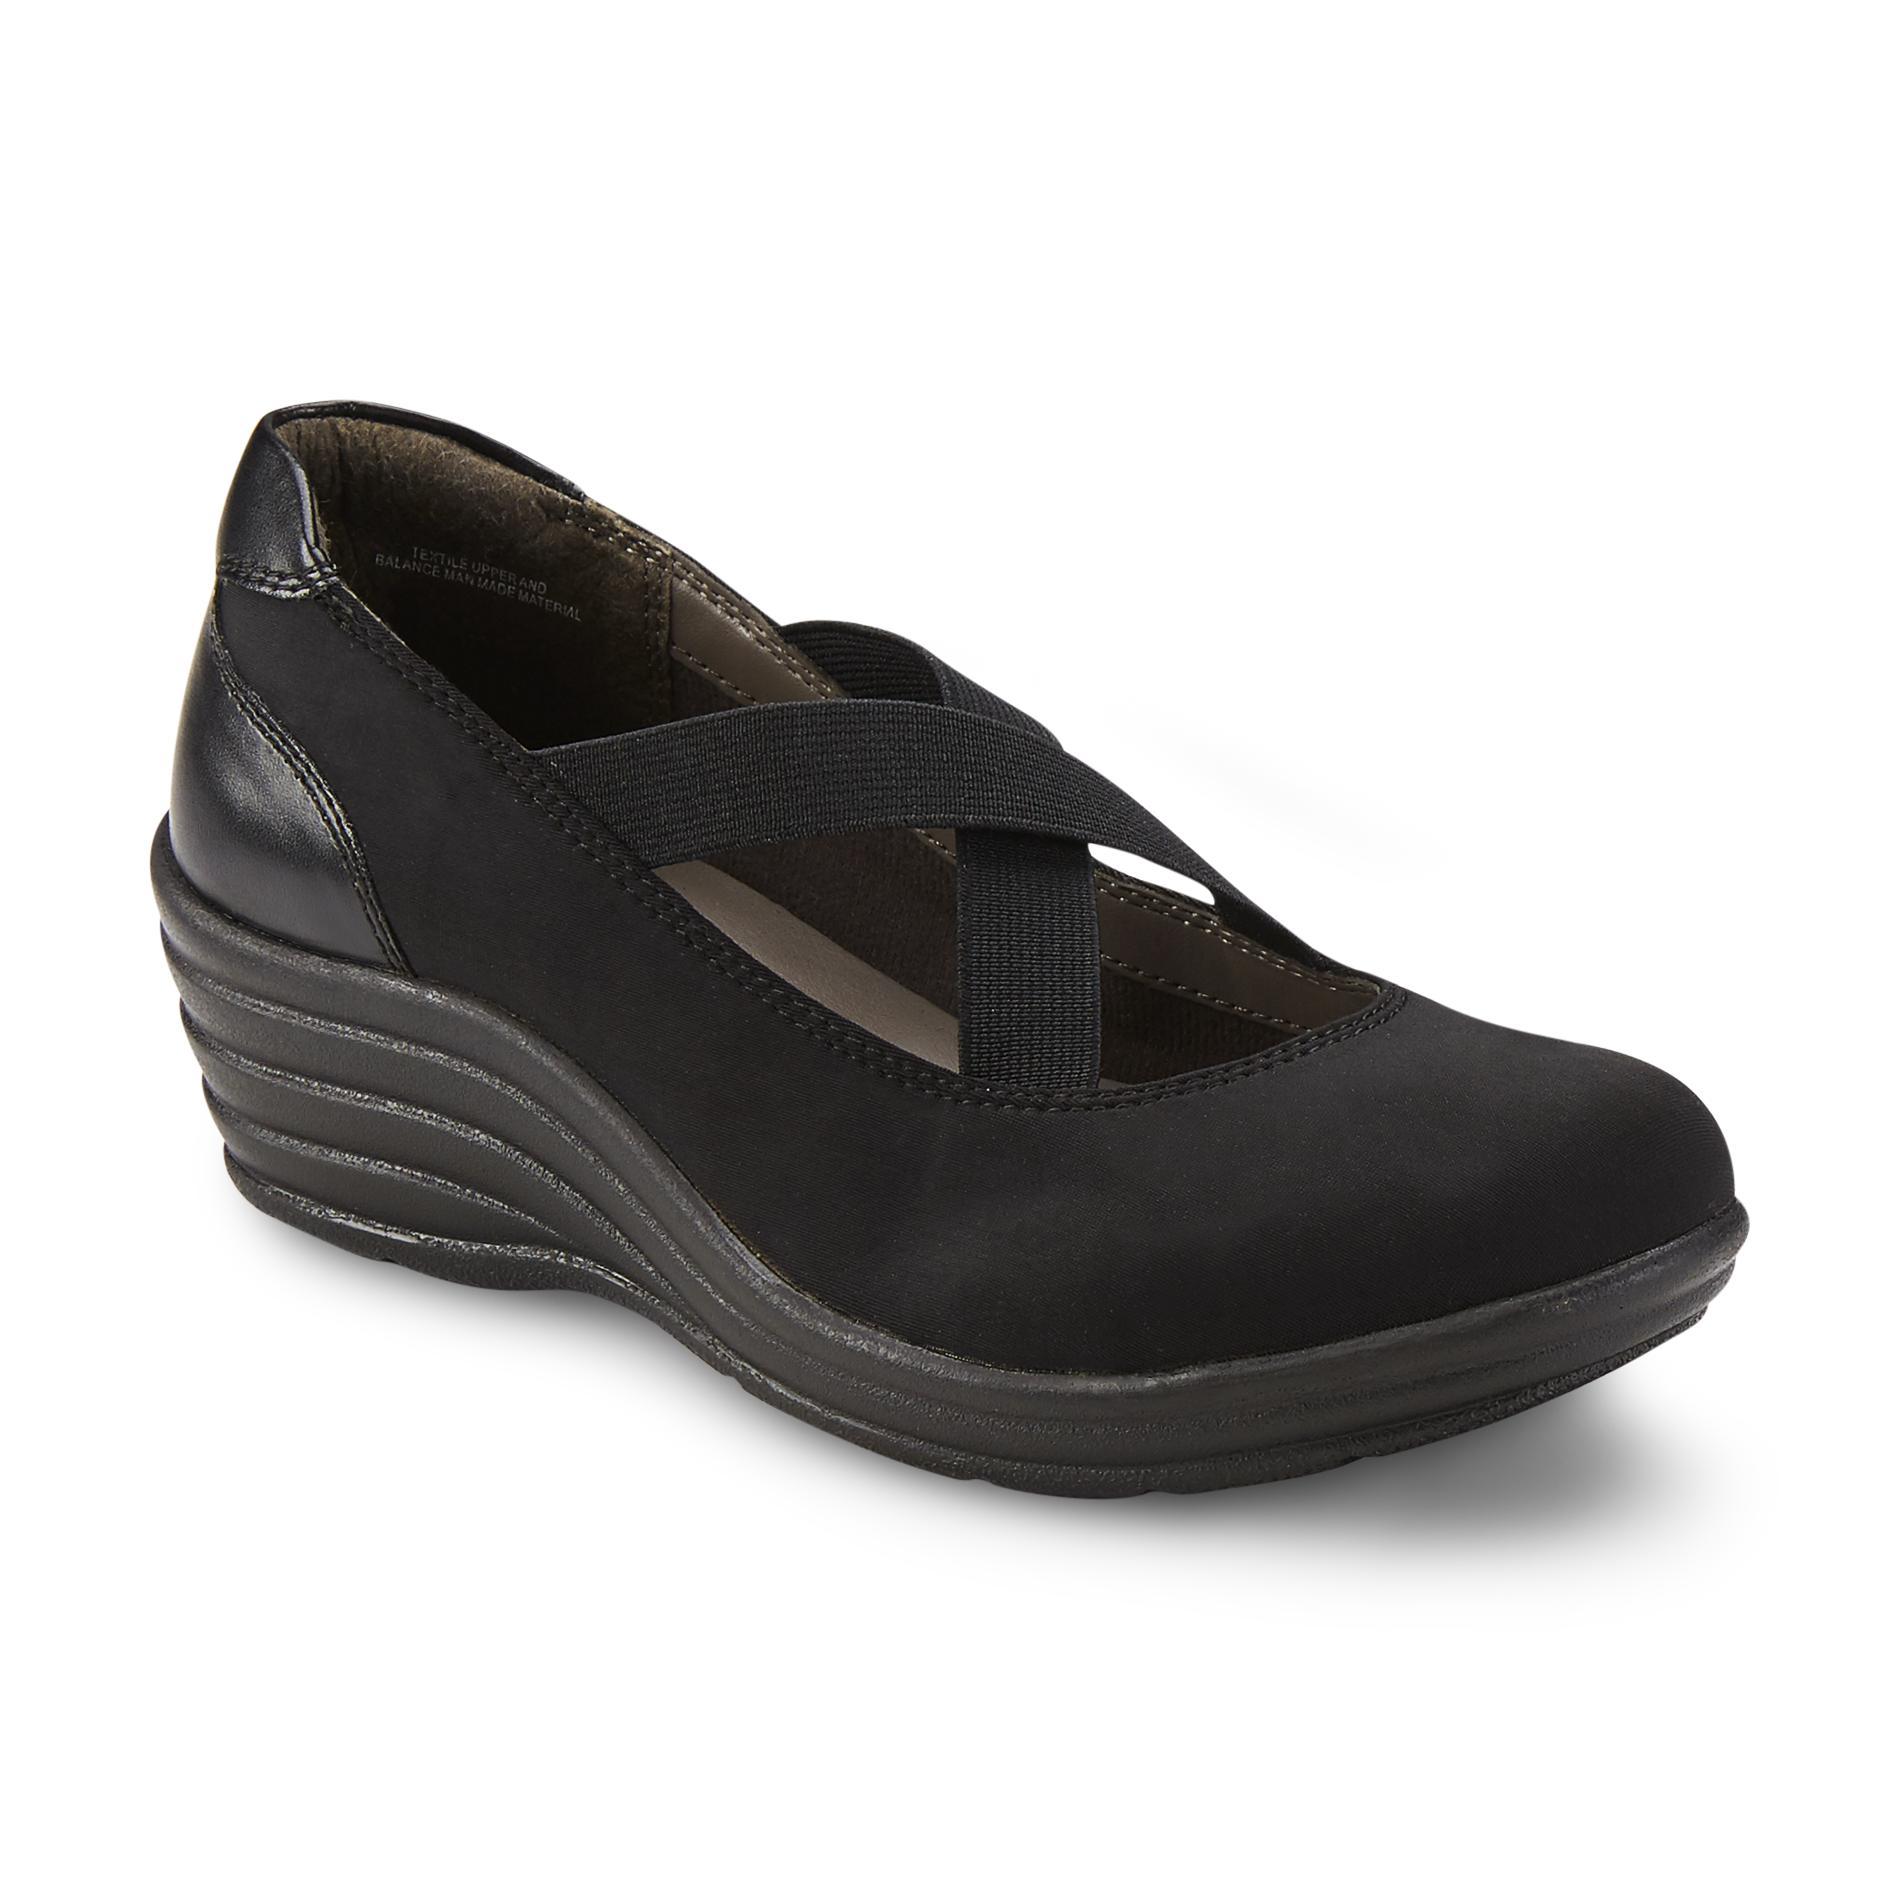 Kmart Dress Code Shoes